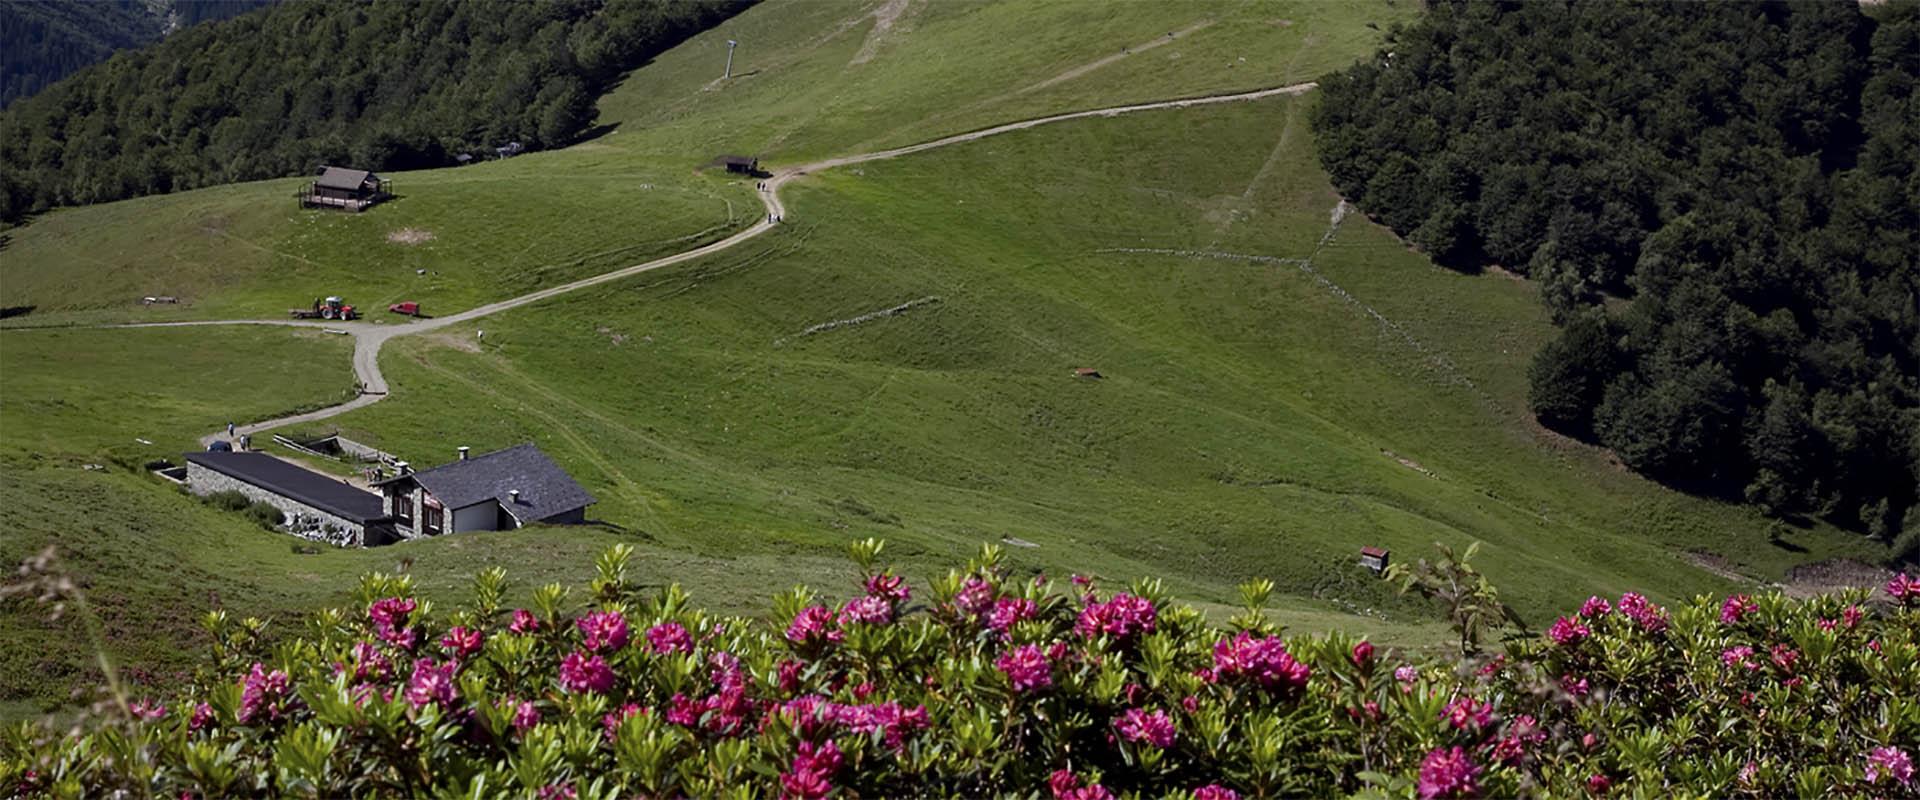 alpemoncerchio-fiori-prati